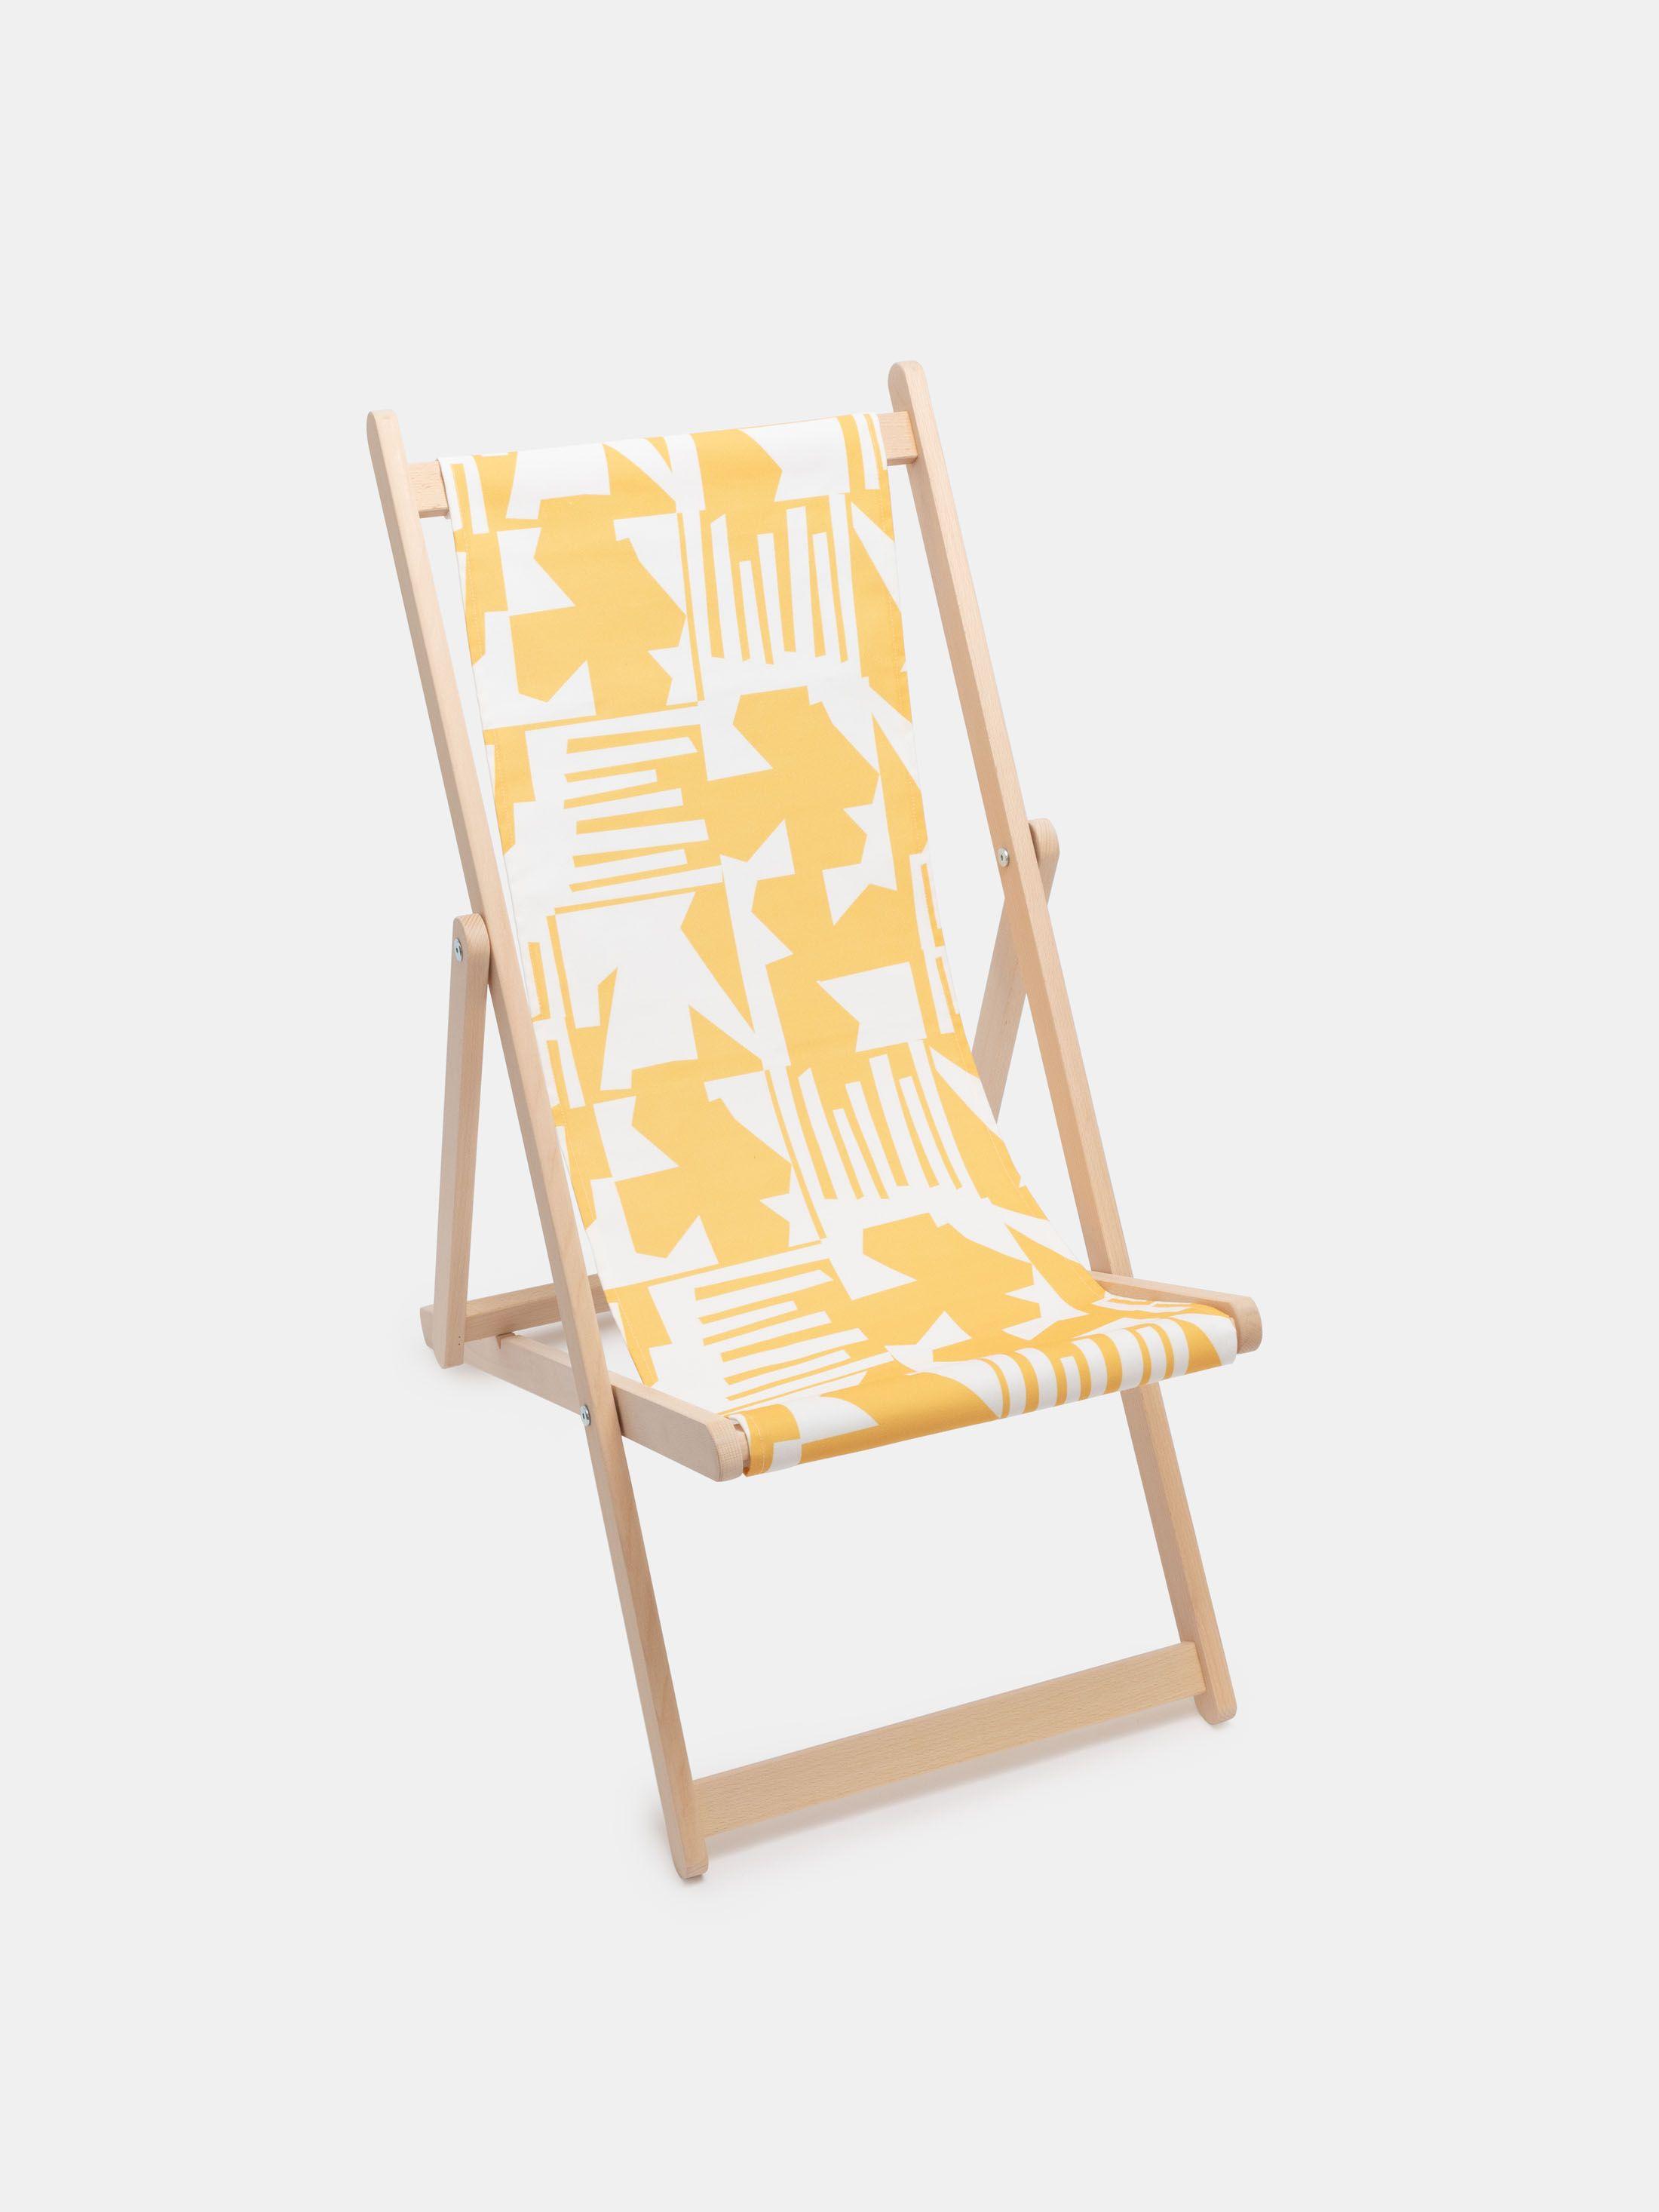 custom deckchairs